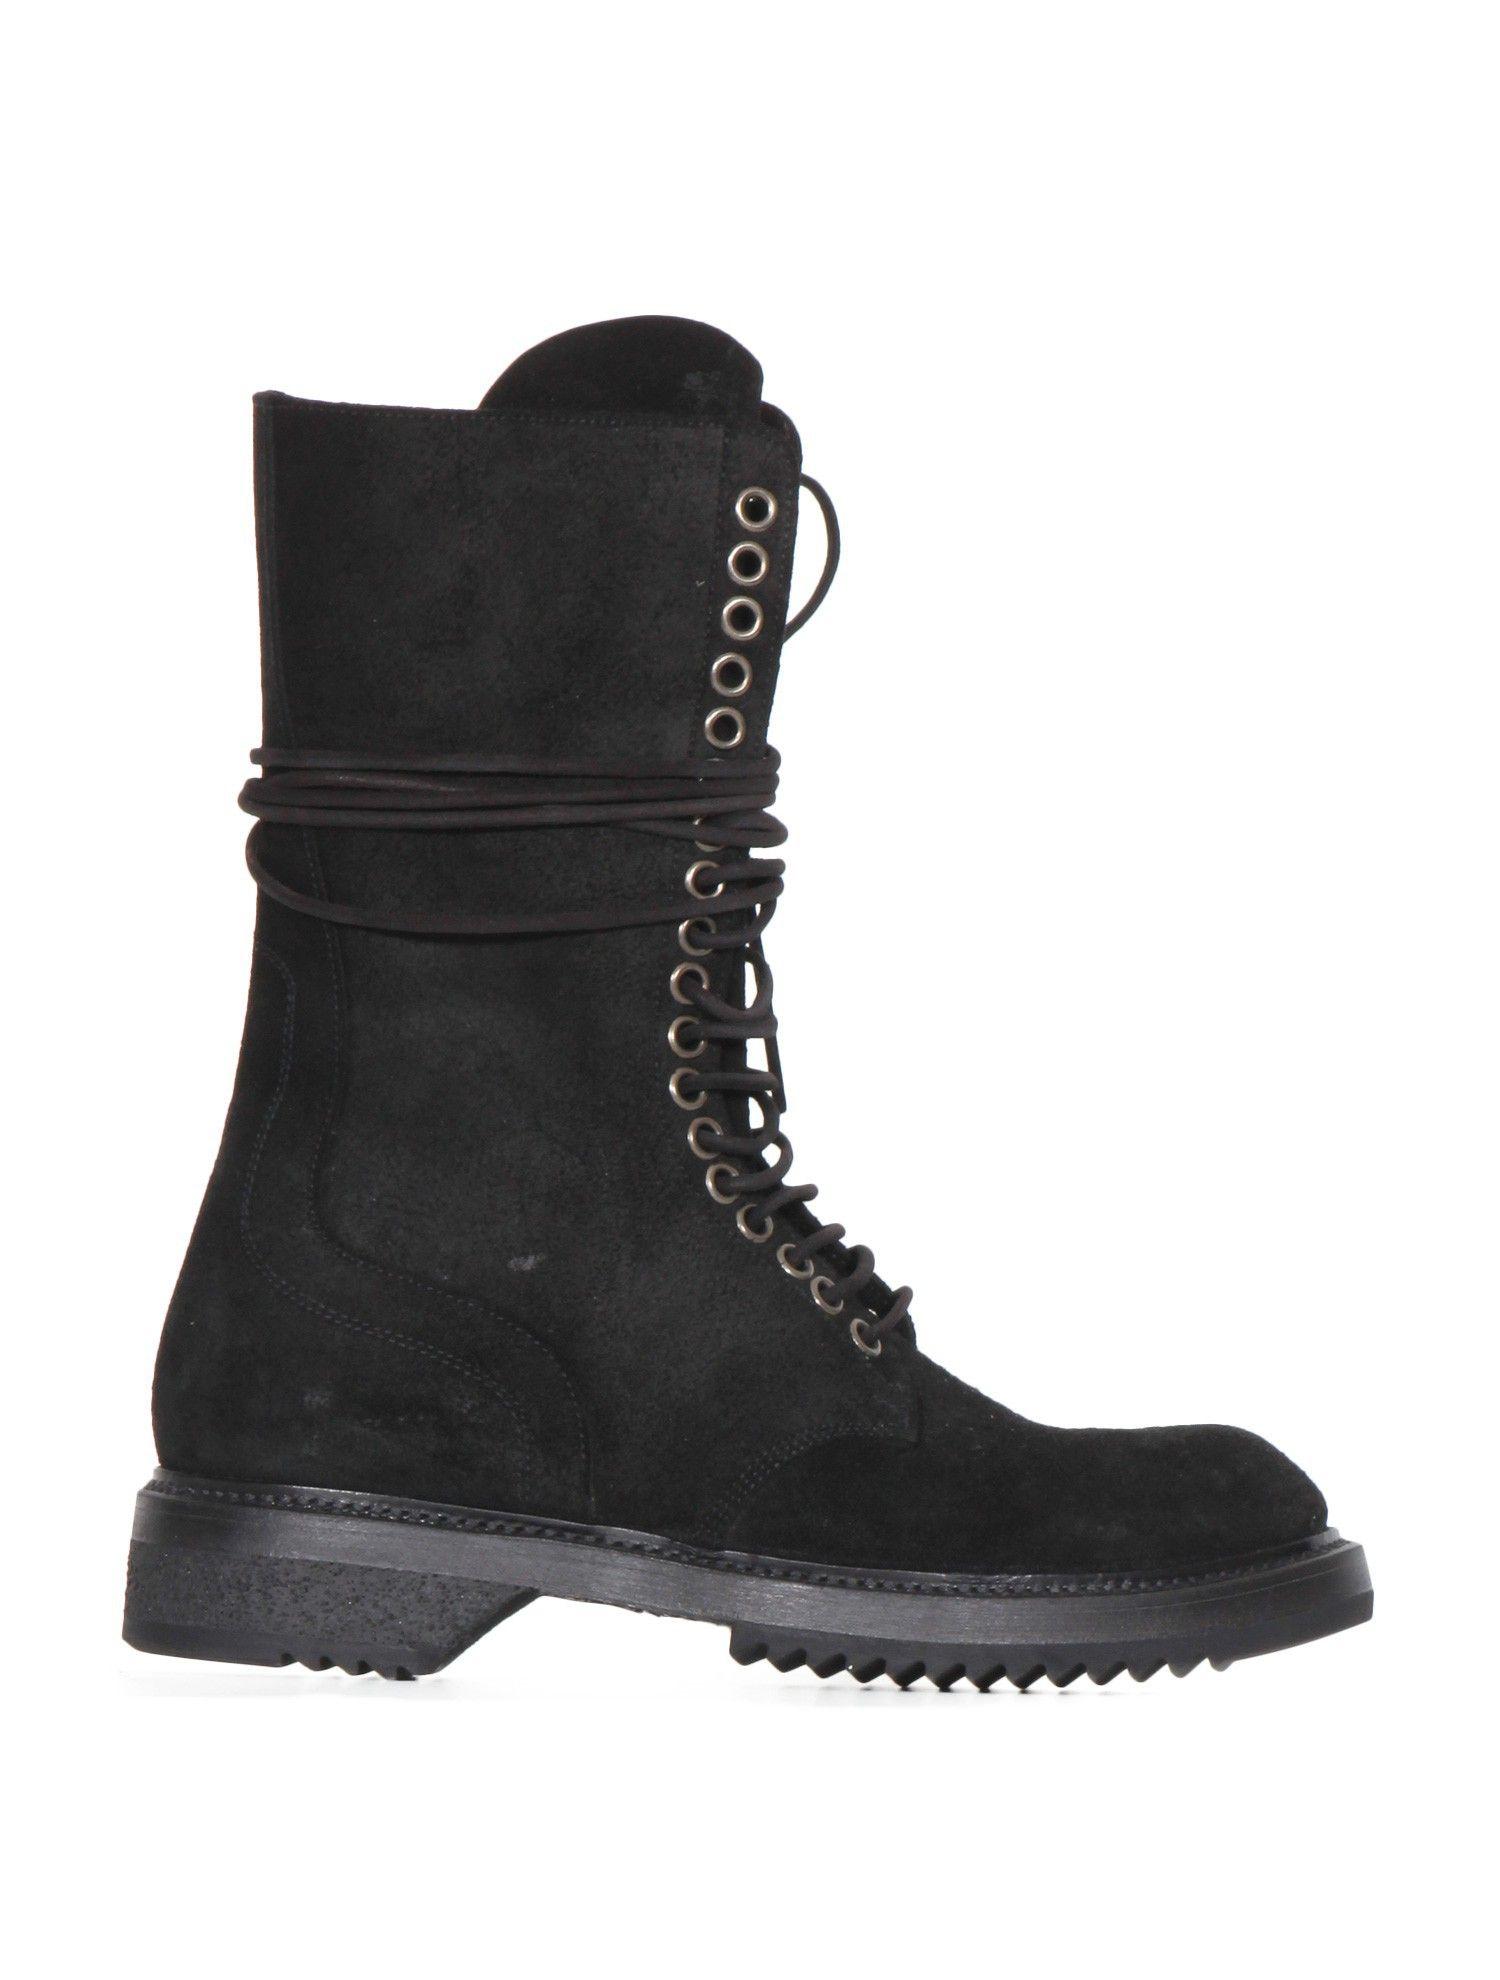 chaussures femme - boots rangers rick owens fw15 sphinx - noir